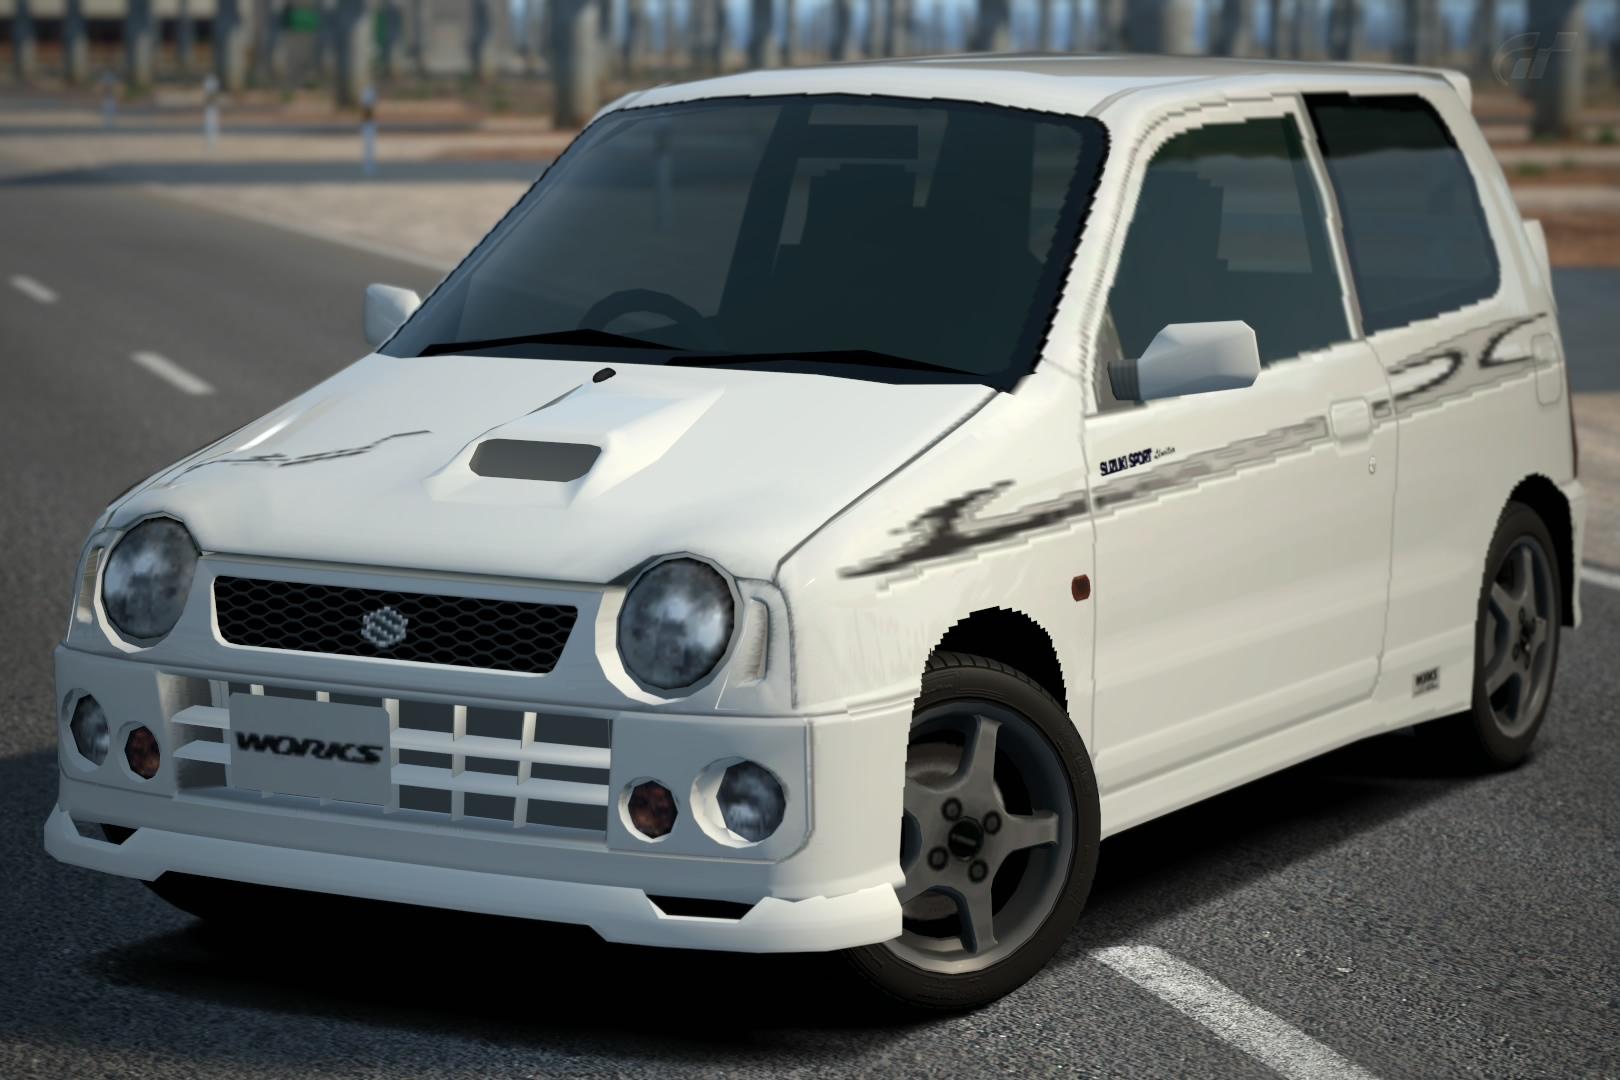 Suzuki ALTO WORKS SUZUKI SPORT LIMITED U002797